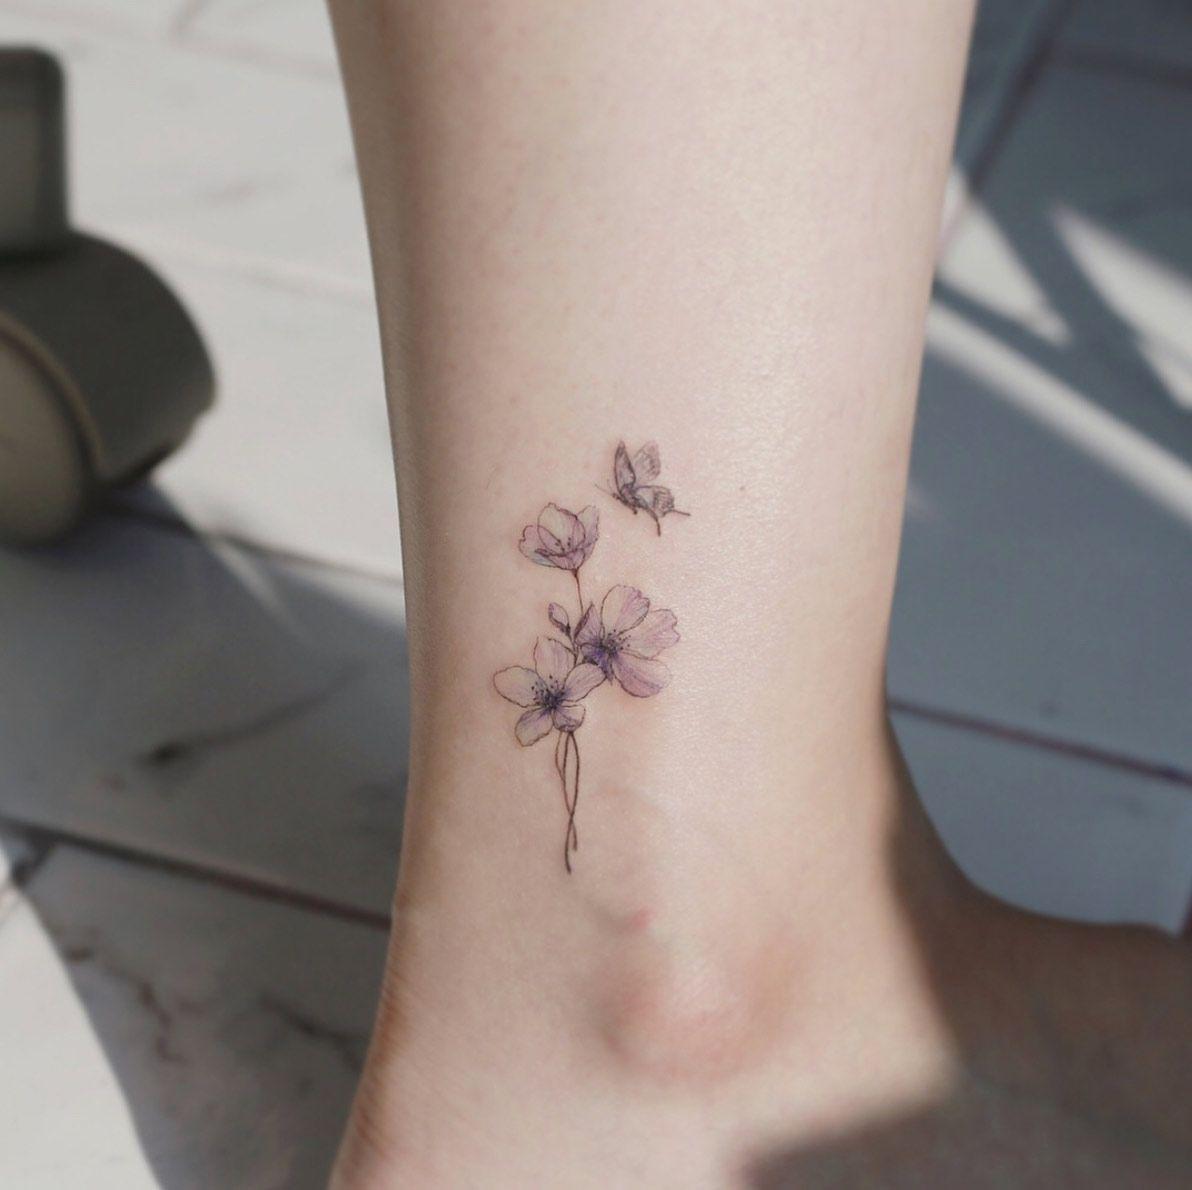 Women Tattoo Flowers Cherry Blossoms - Women